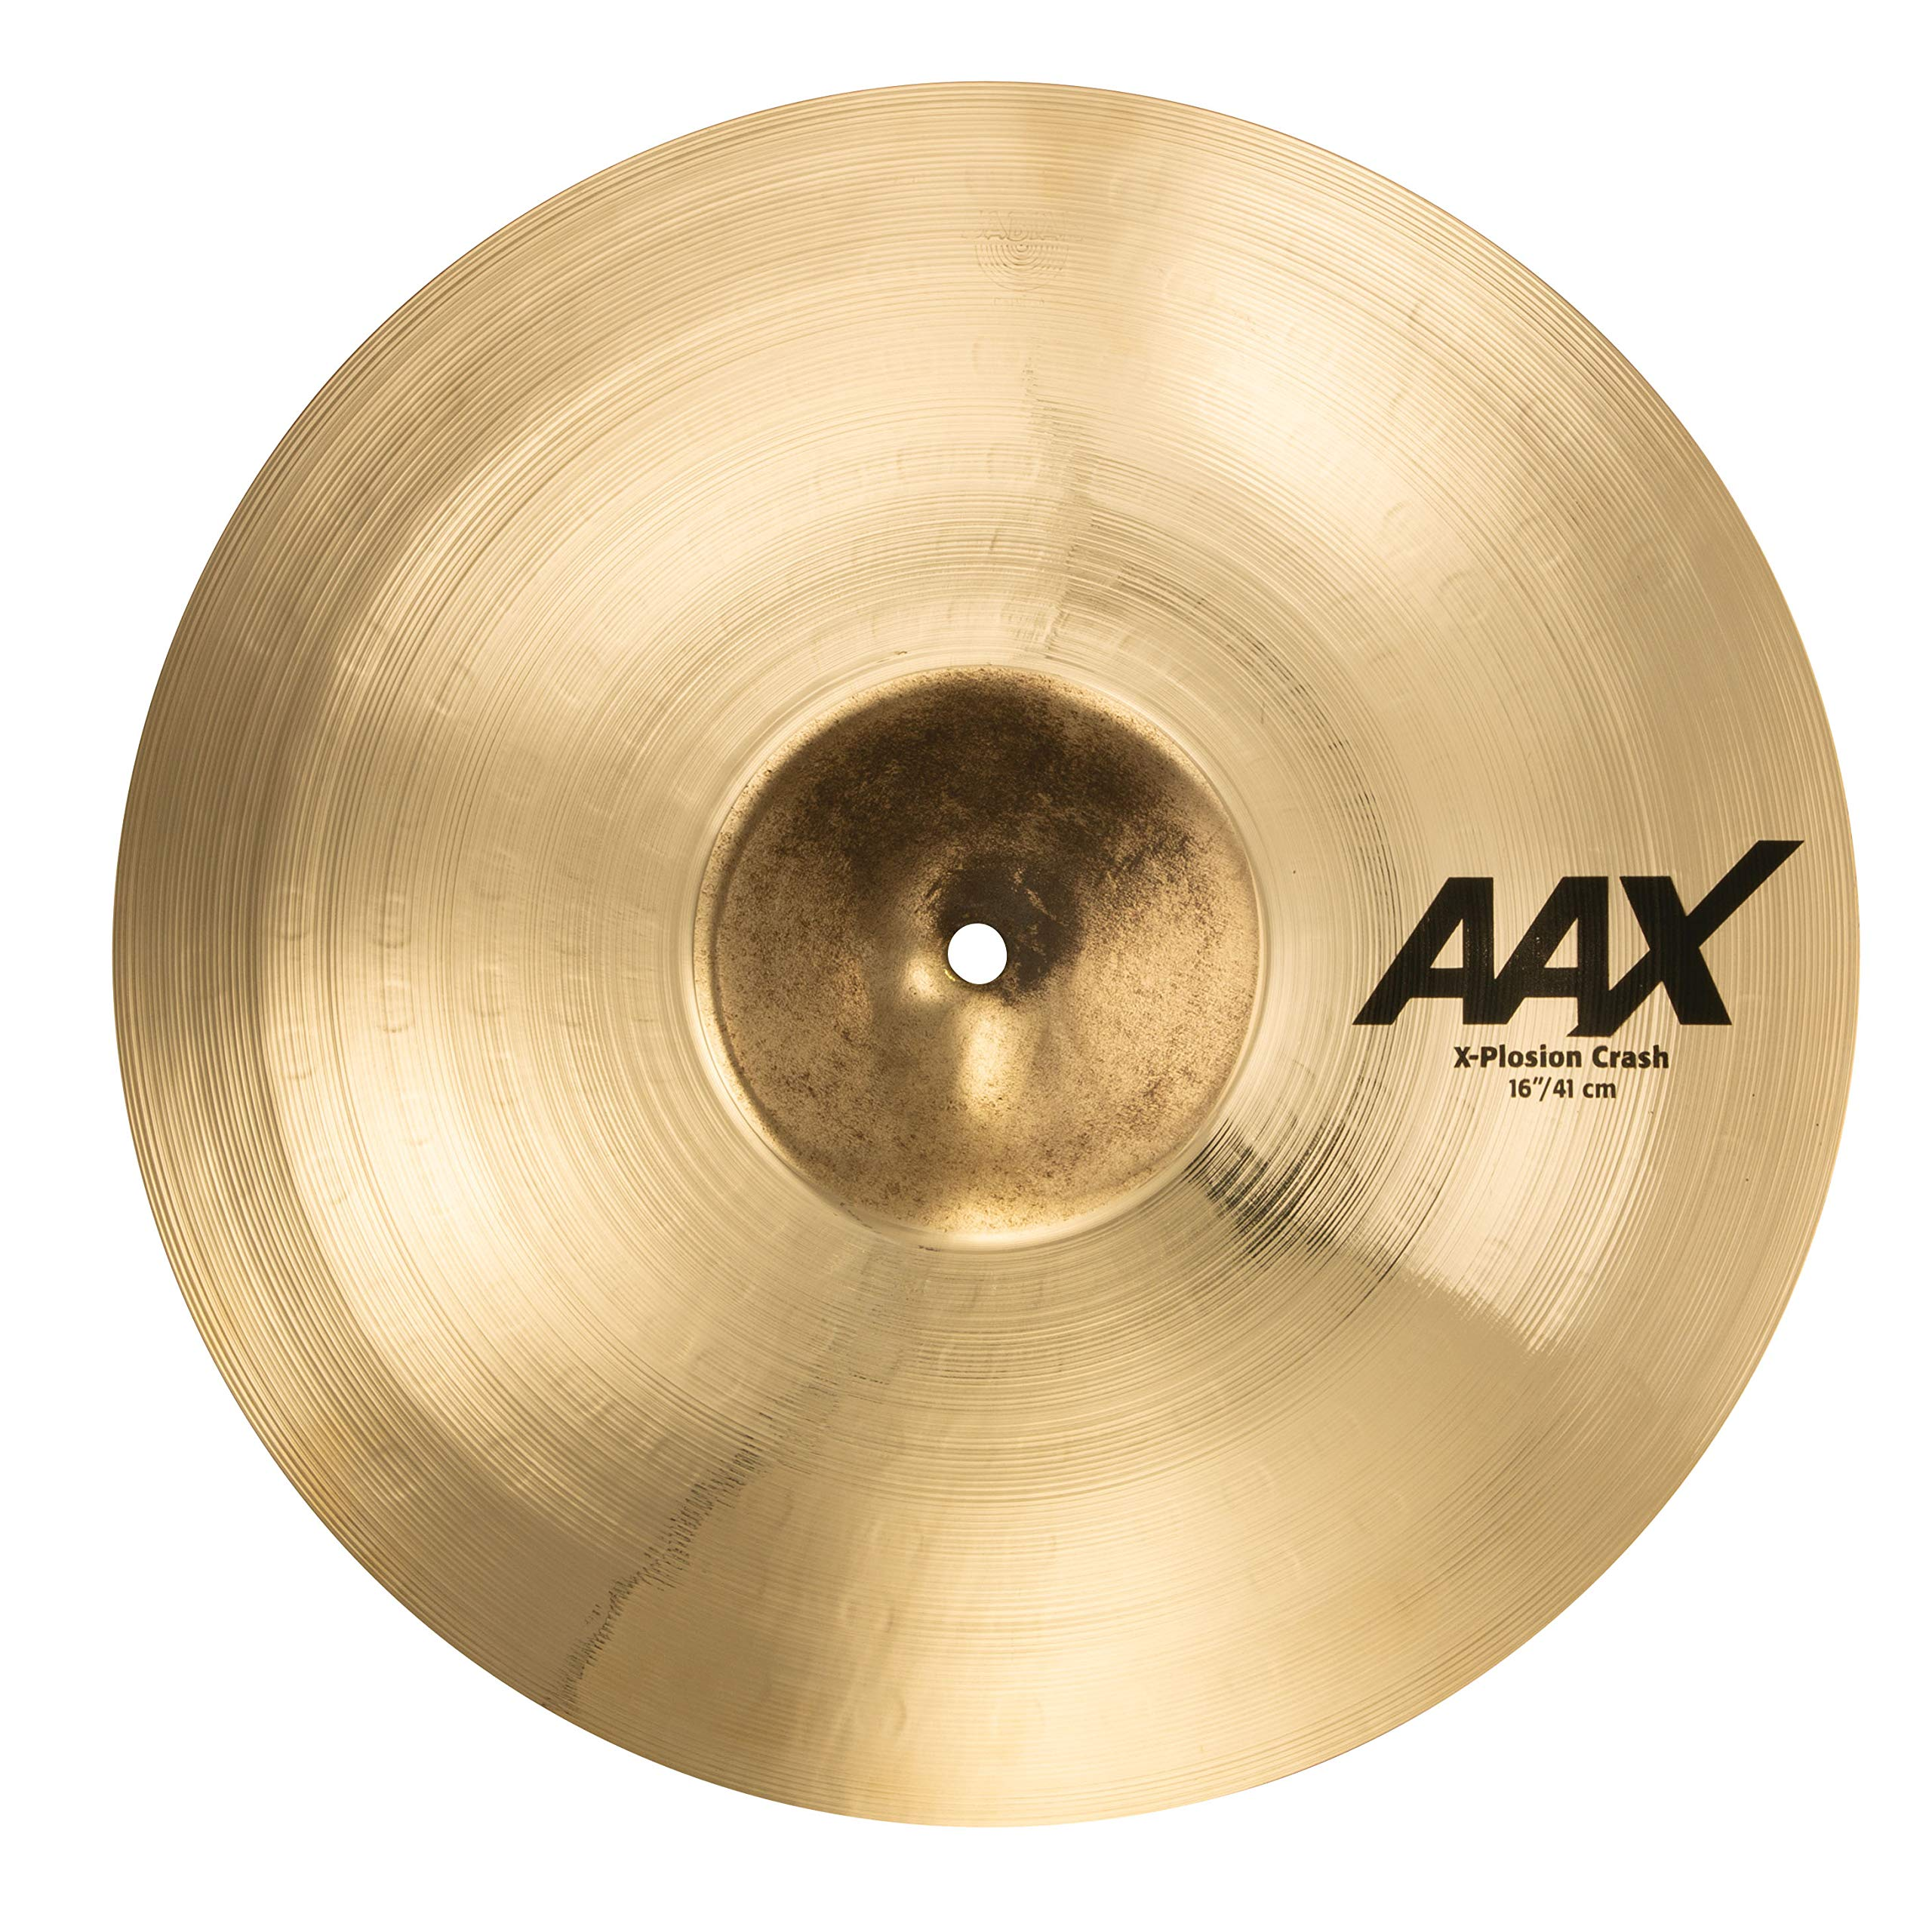 Sabian AAX 16'' X-Plosion Crash Cymbal, Brilliant Finish by Sabian